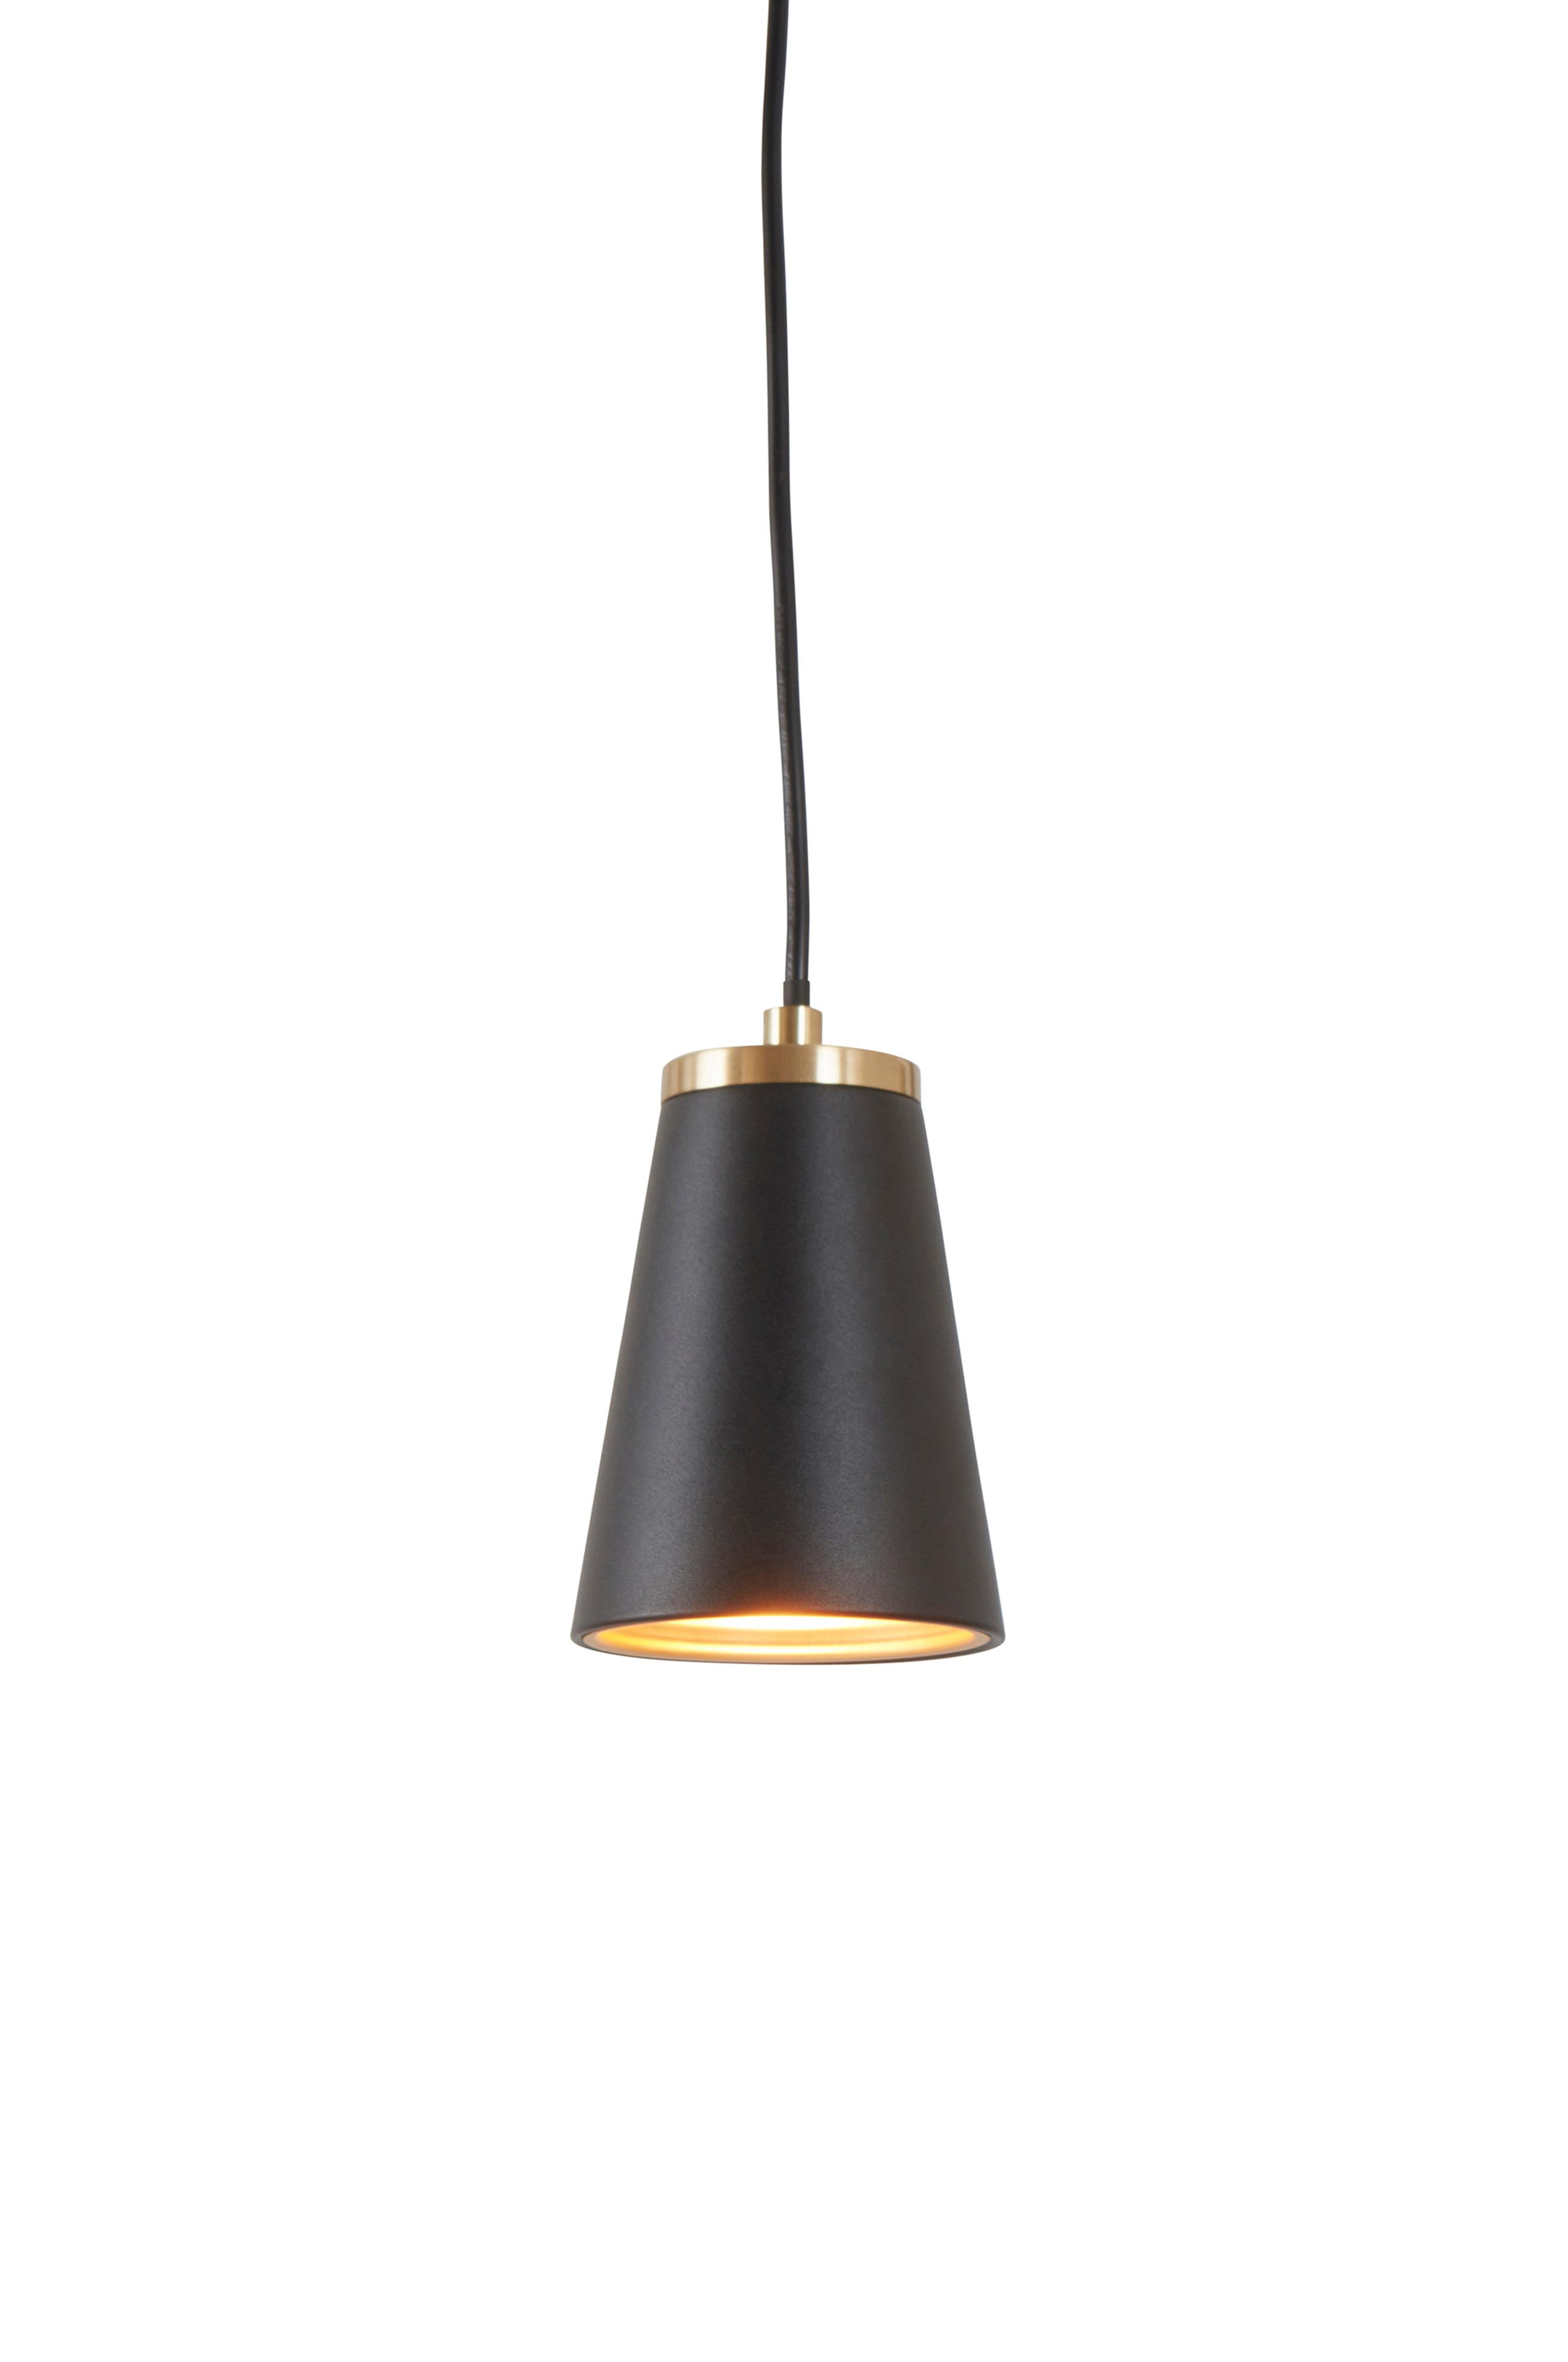 Stubbs Fonsterlampa I 2020 Fonsterlampor Belysning Tak Hangande Lampa